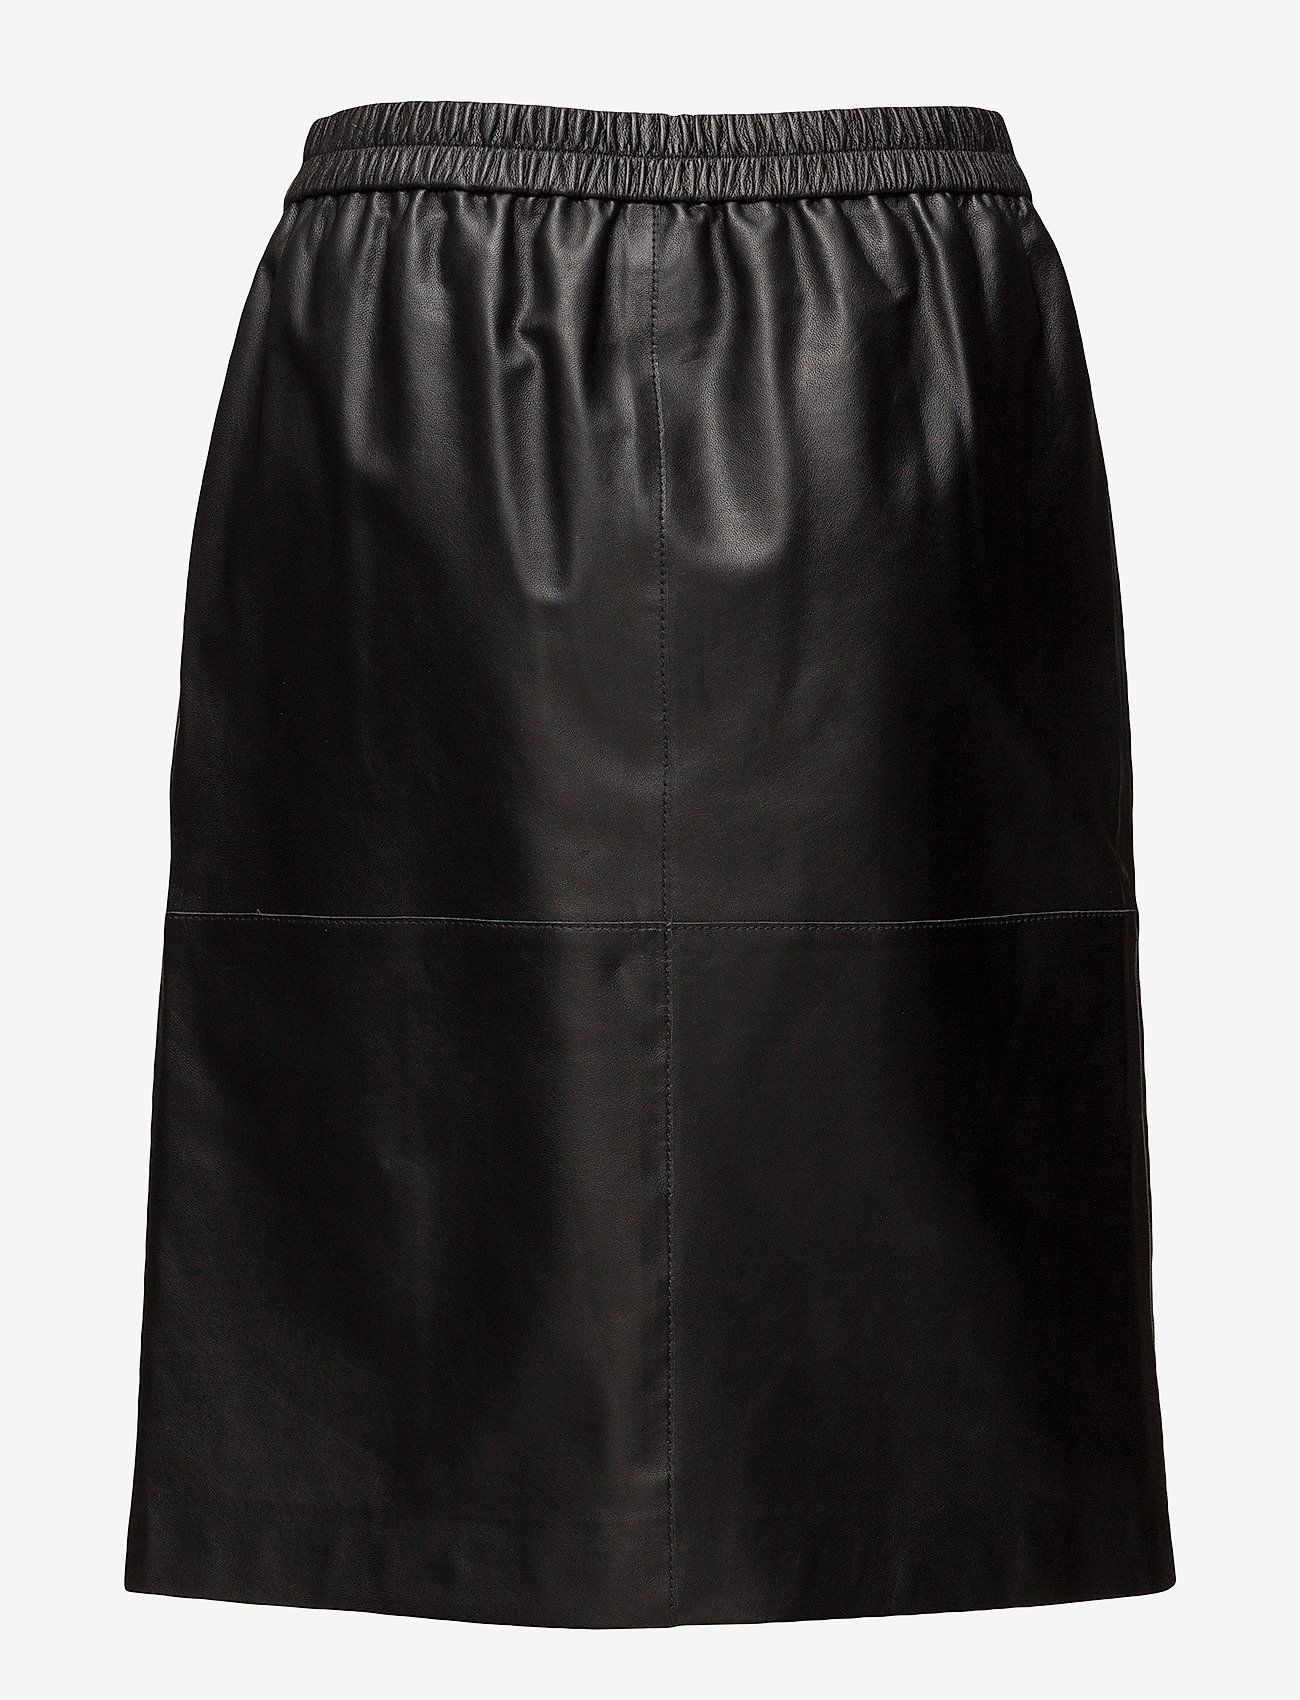 Agnes Leather Skirt (Black) - Filippa K HNup4H